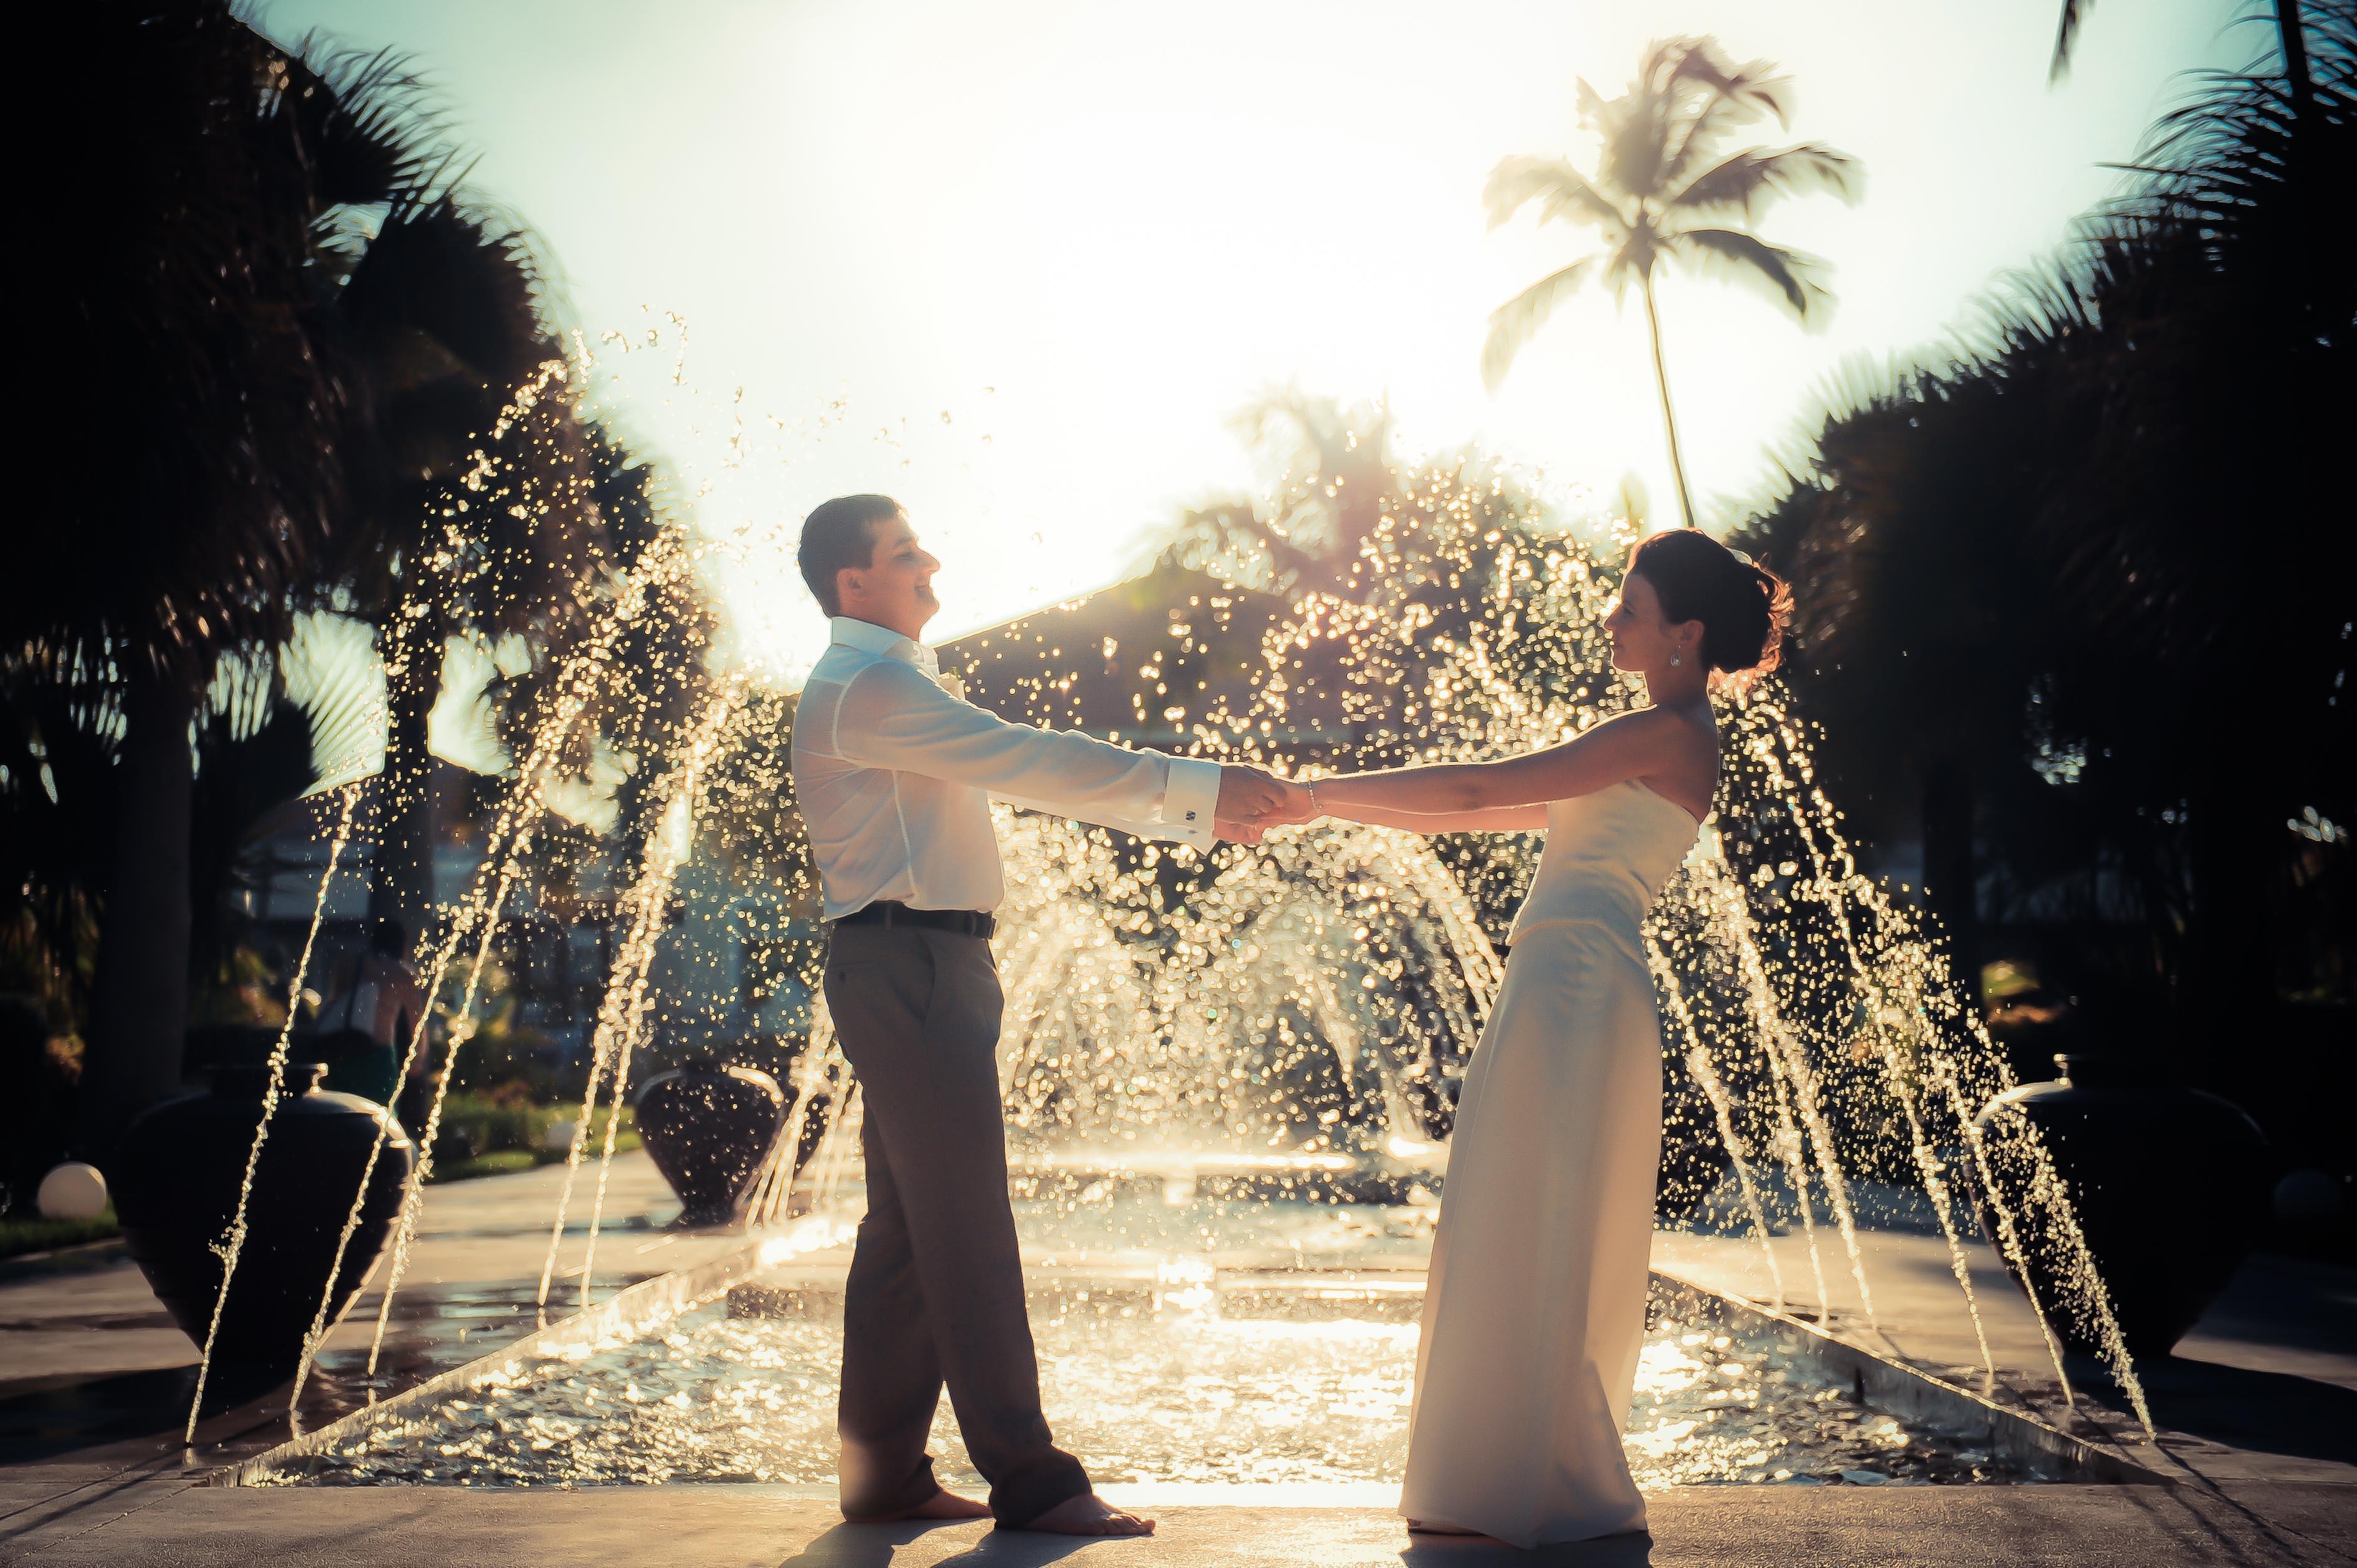 Fotografo de boda en Punta ana